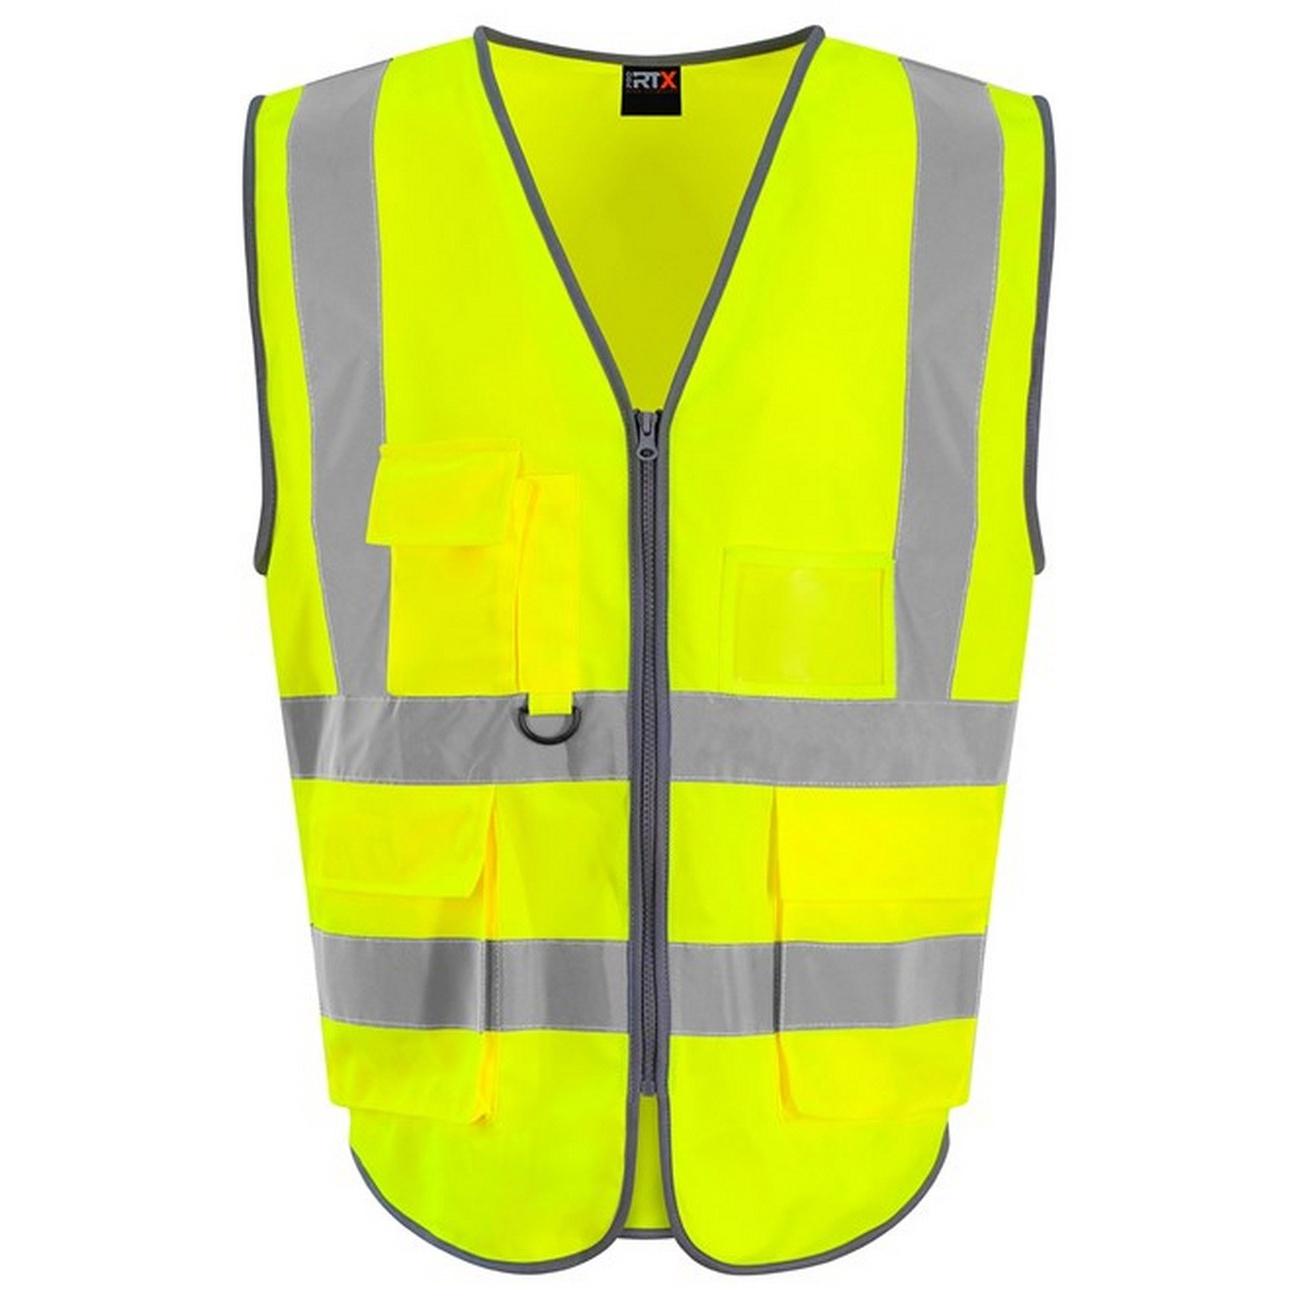 Pro RTX High Visibility Unisex Adults Executive Waistcoat (XL) (Yellow)